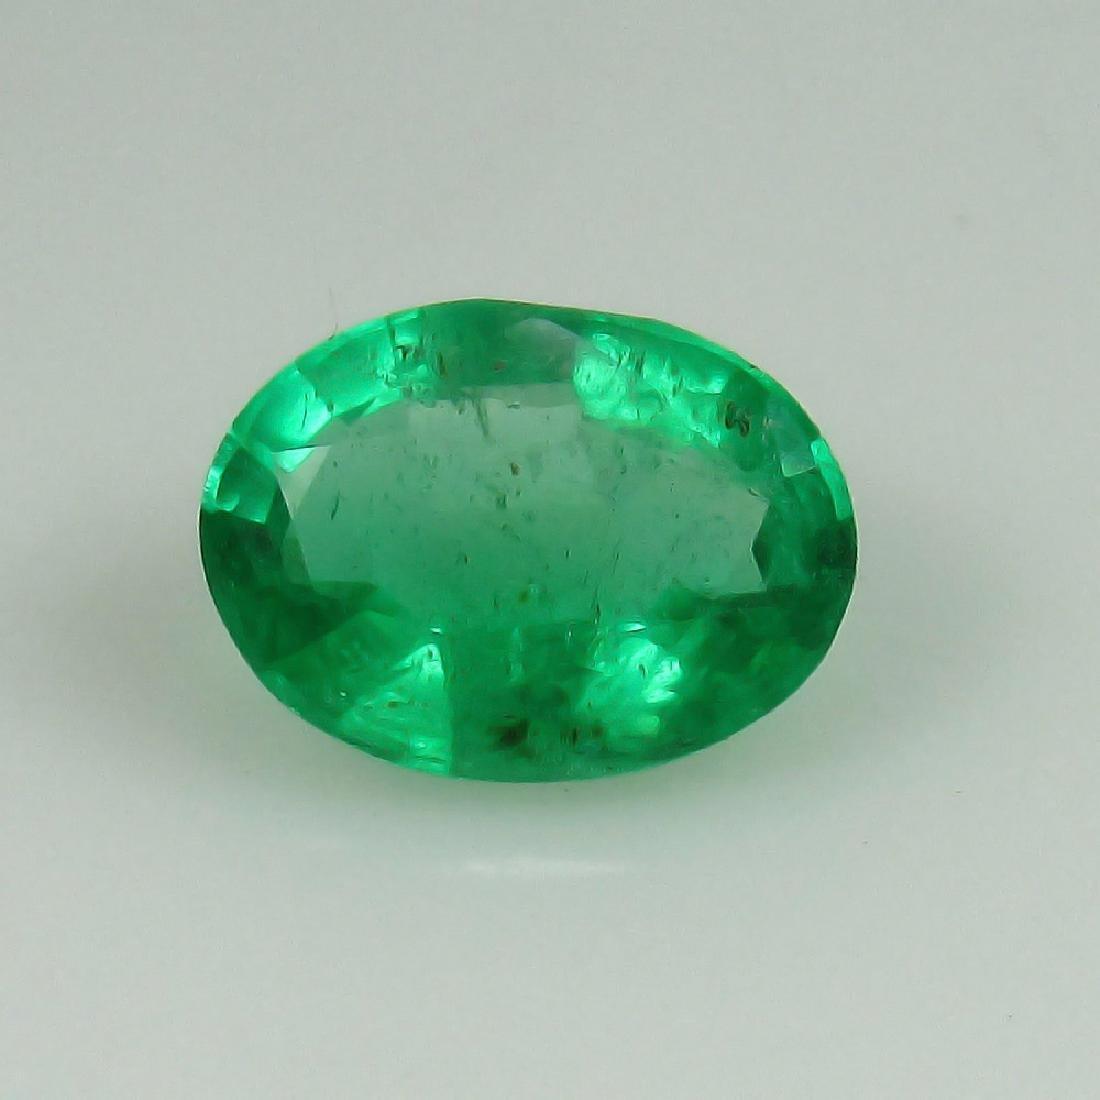 0.95 Ct Genuine Zambian Emerald 8X6 mm Oval cut Top - 2